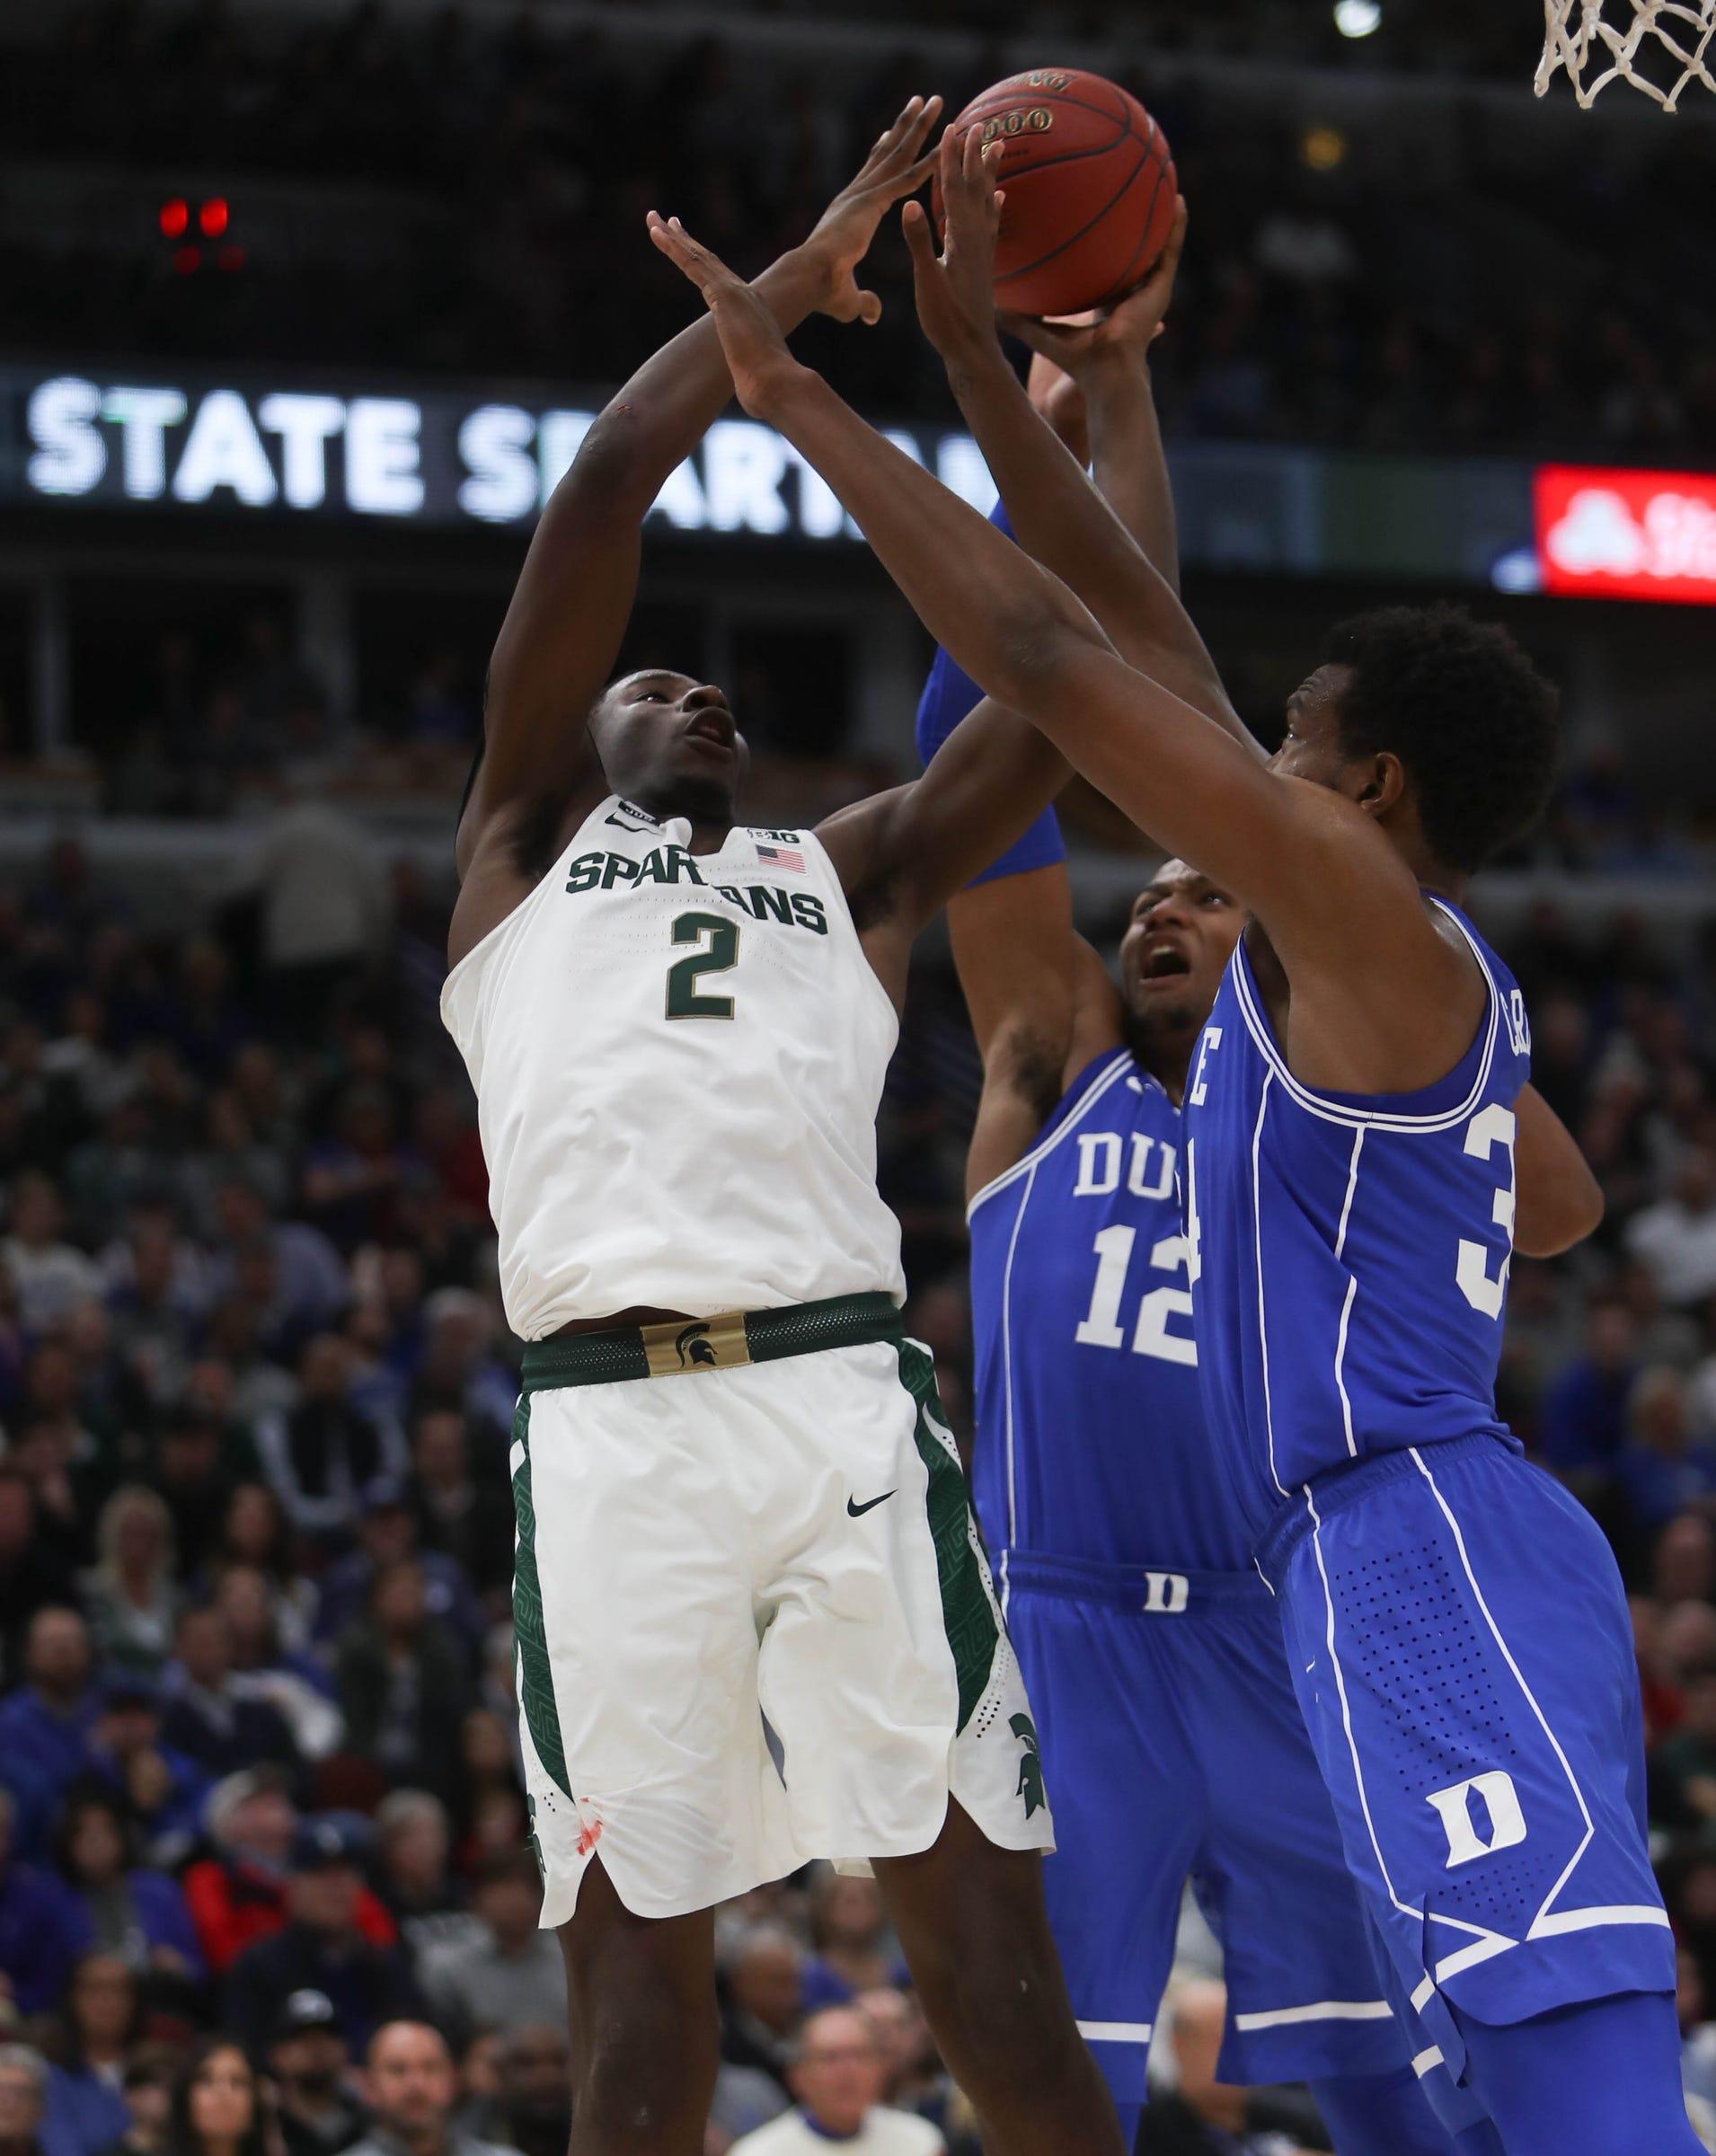 Michigan State's Jaren Jackson Jr. scores against Duke's